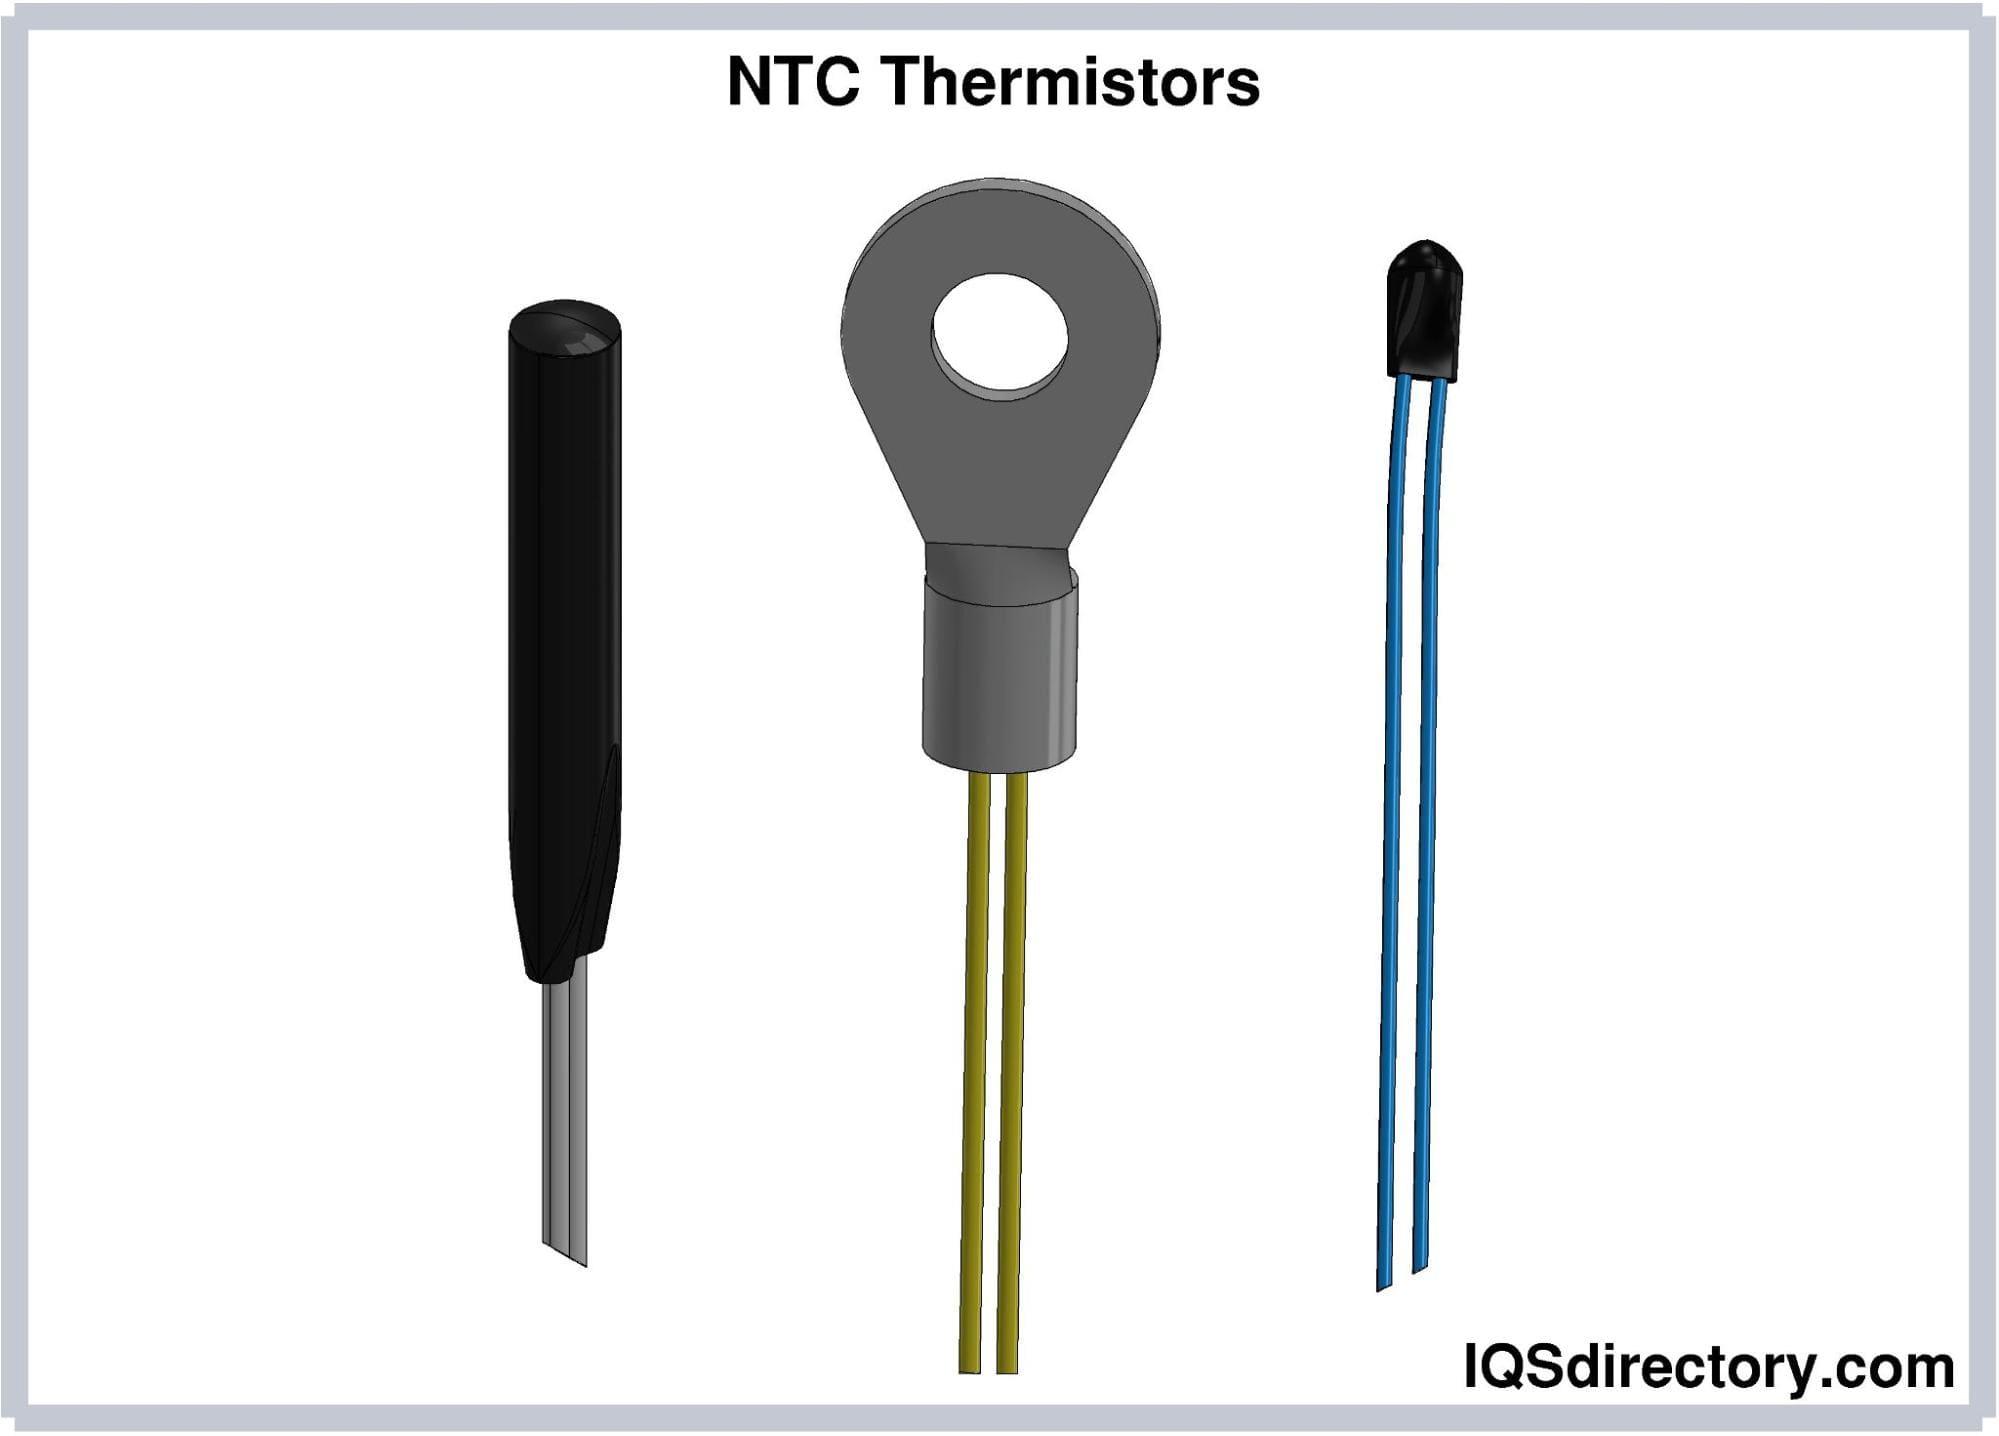 NTC Thermistors